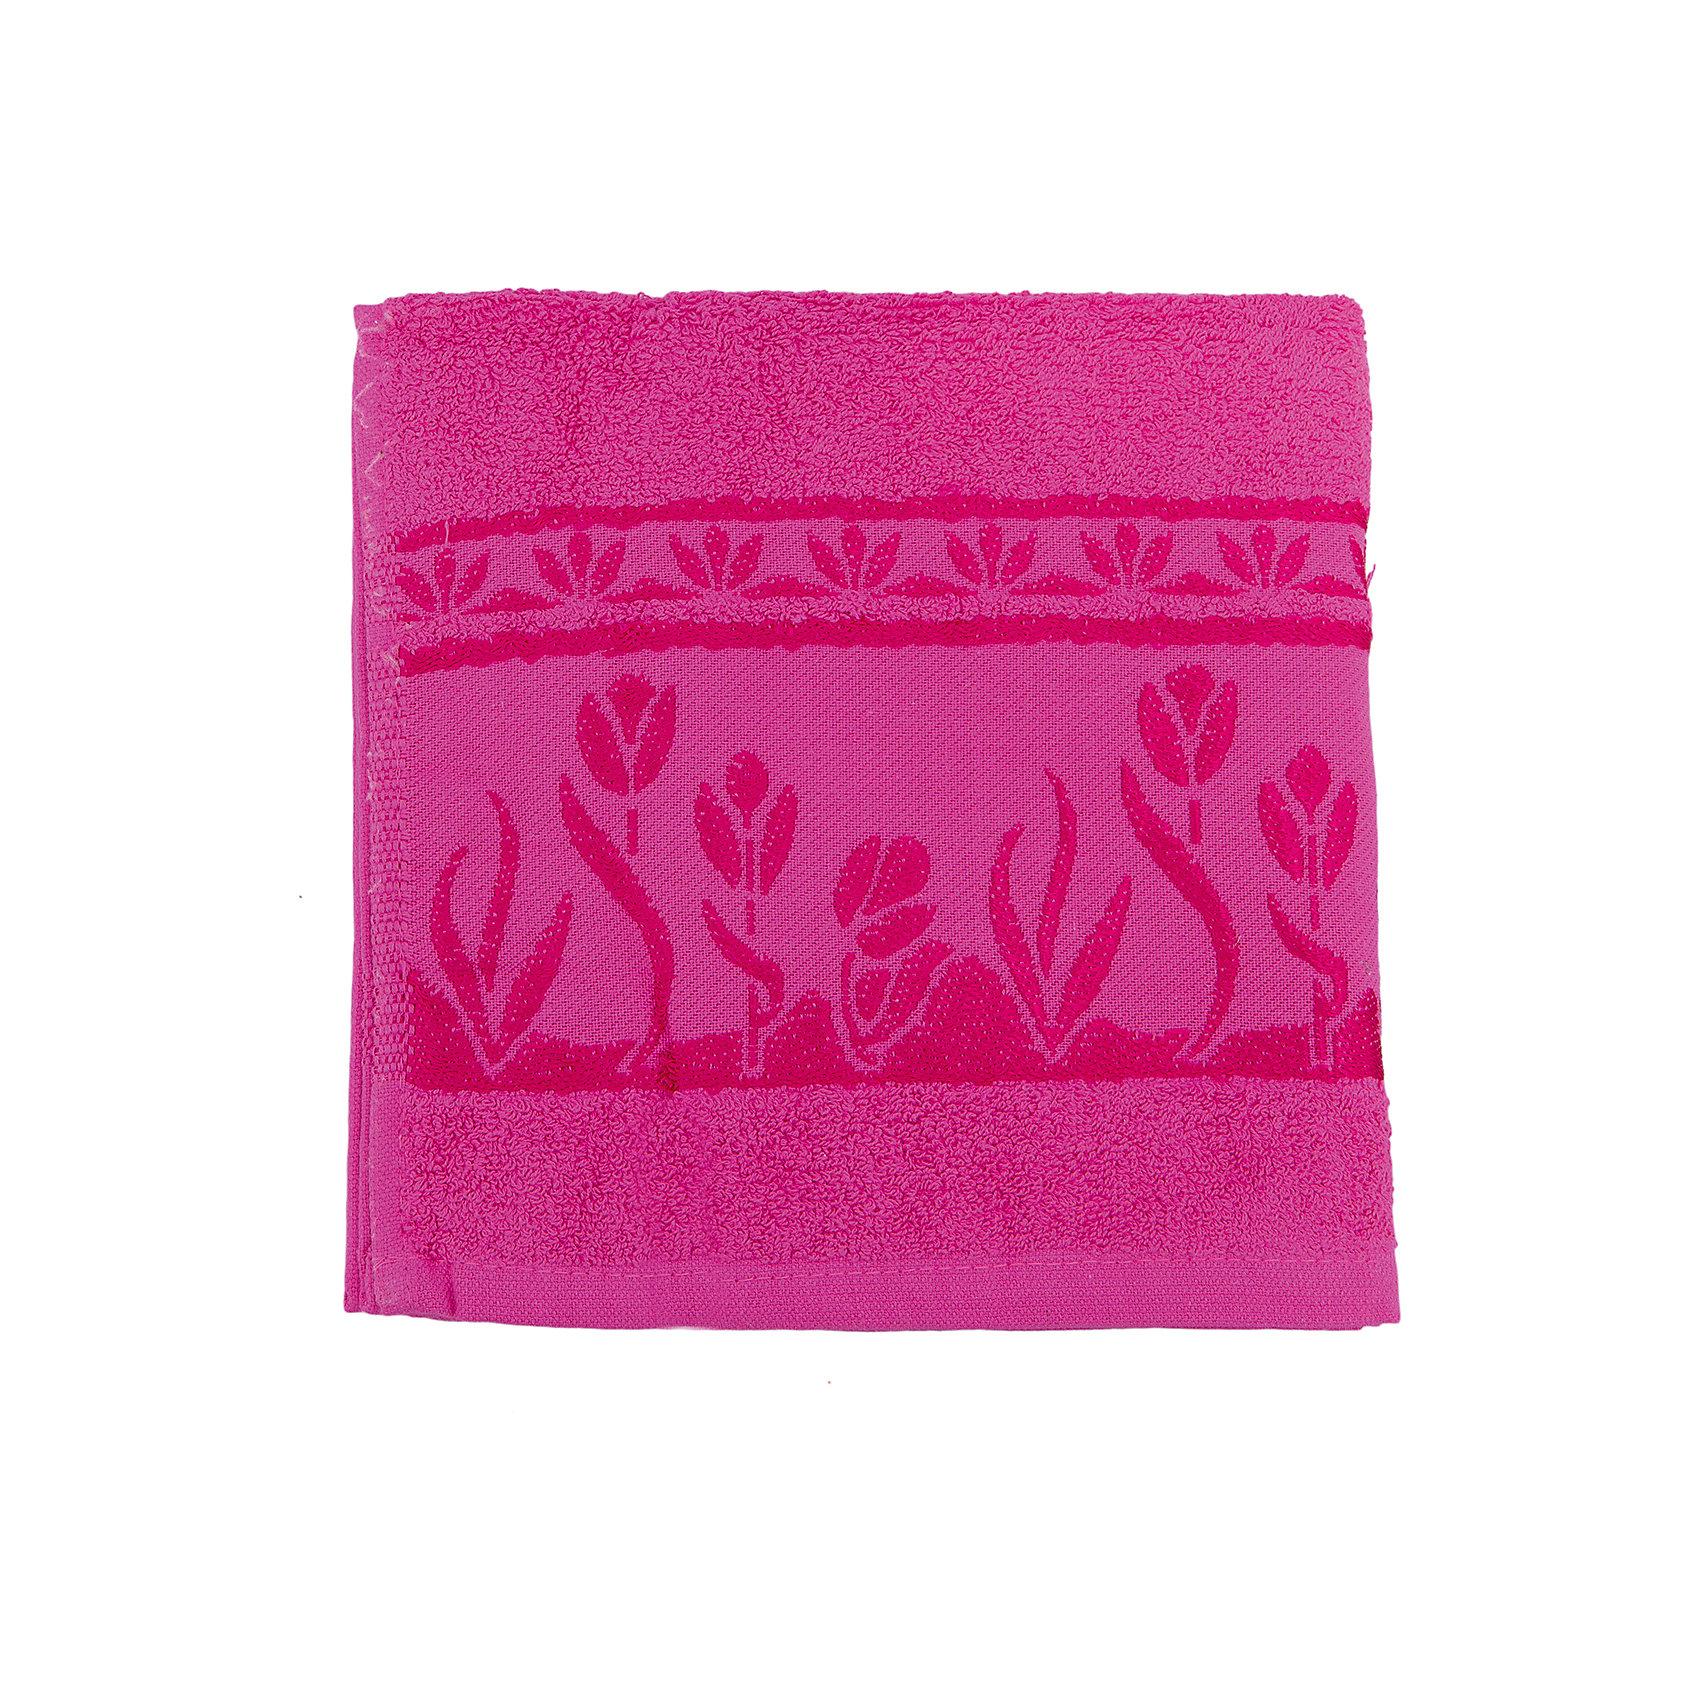 Португалия Полотенце махровое Tulips 50*100, Португалия, ярко-розовый футболка мужская abercrombie